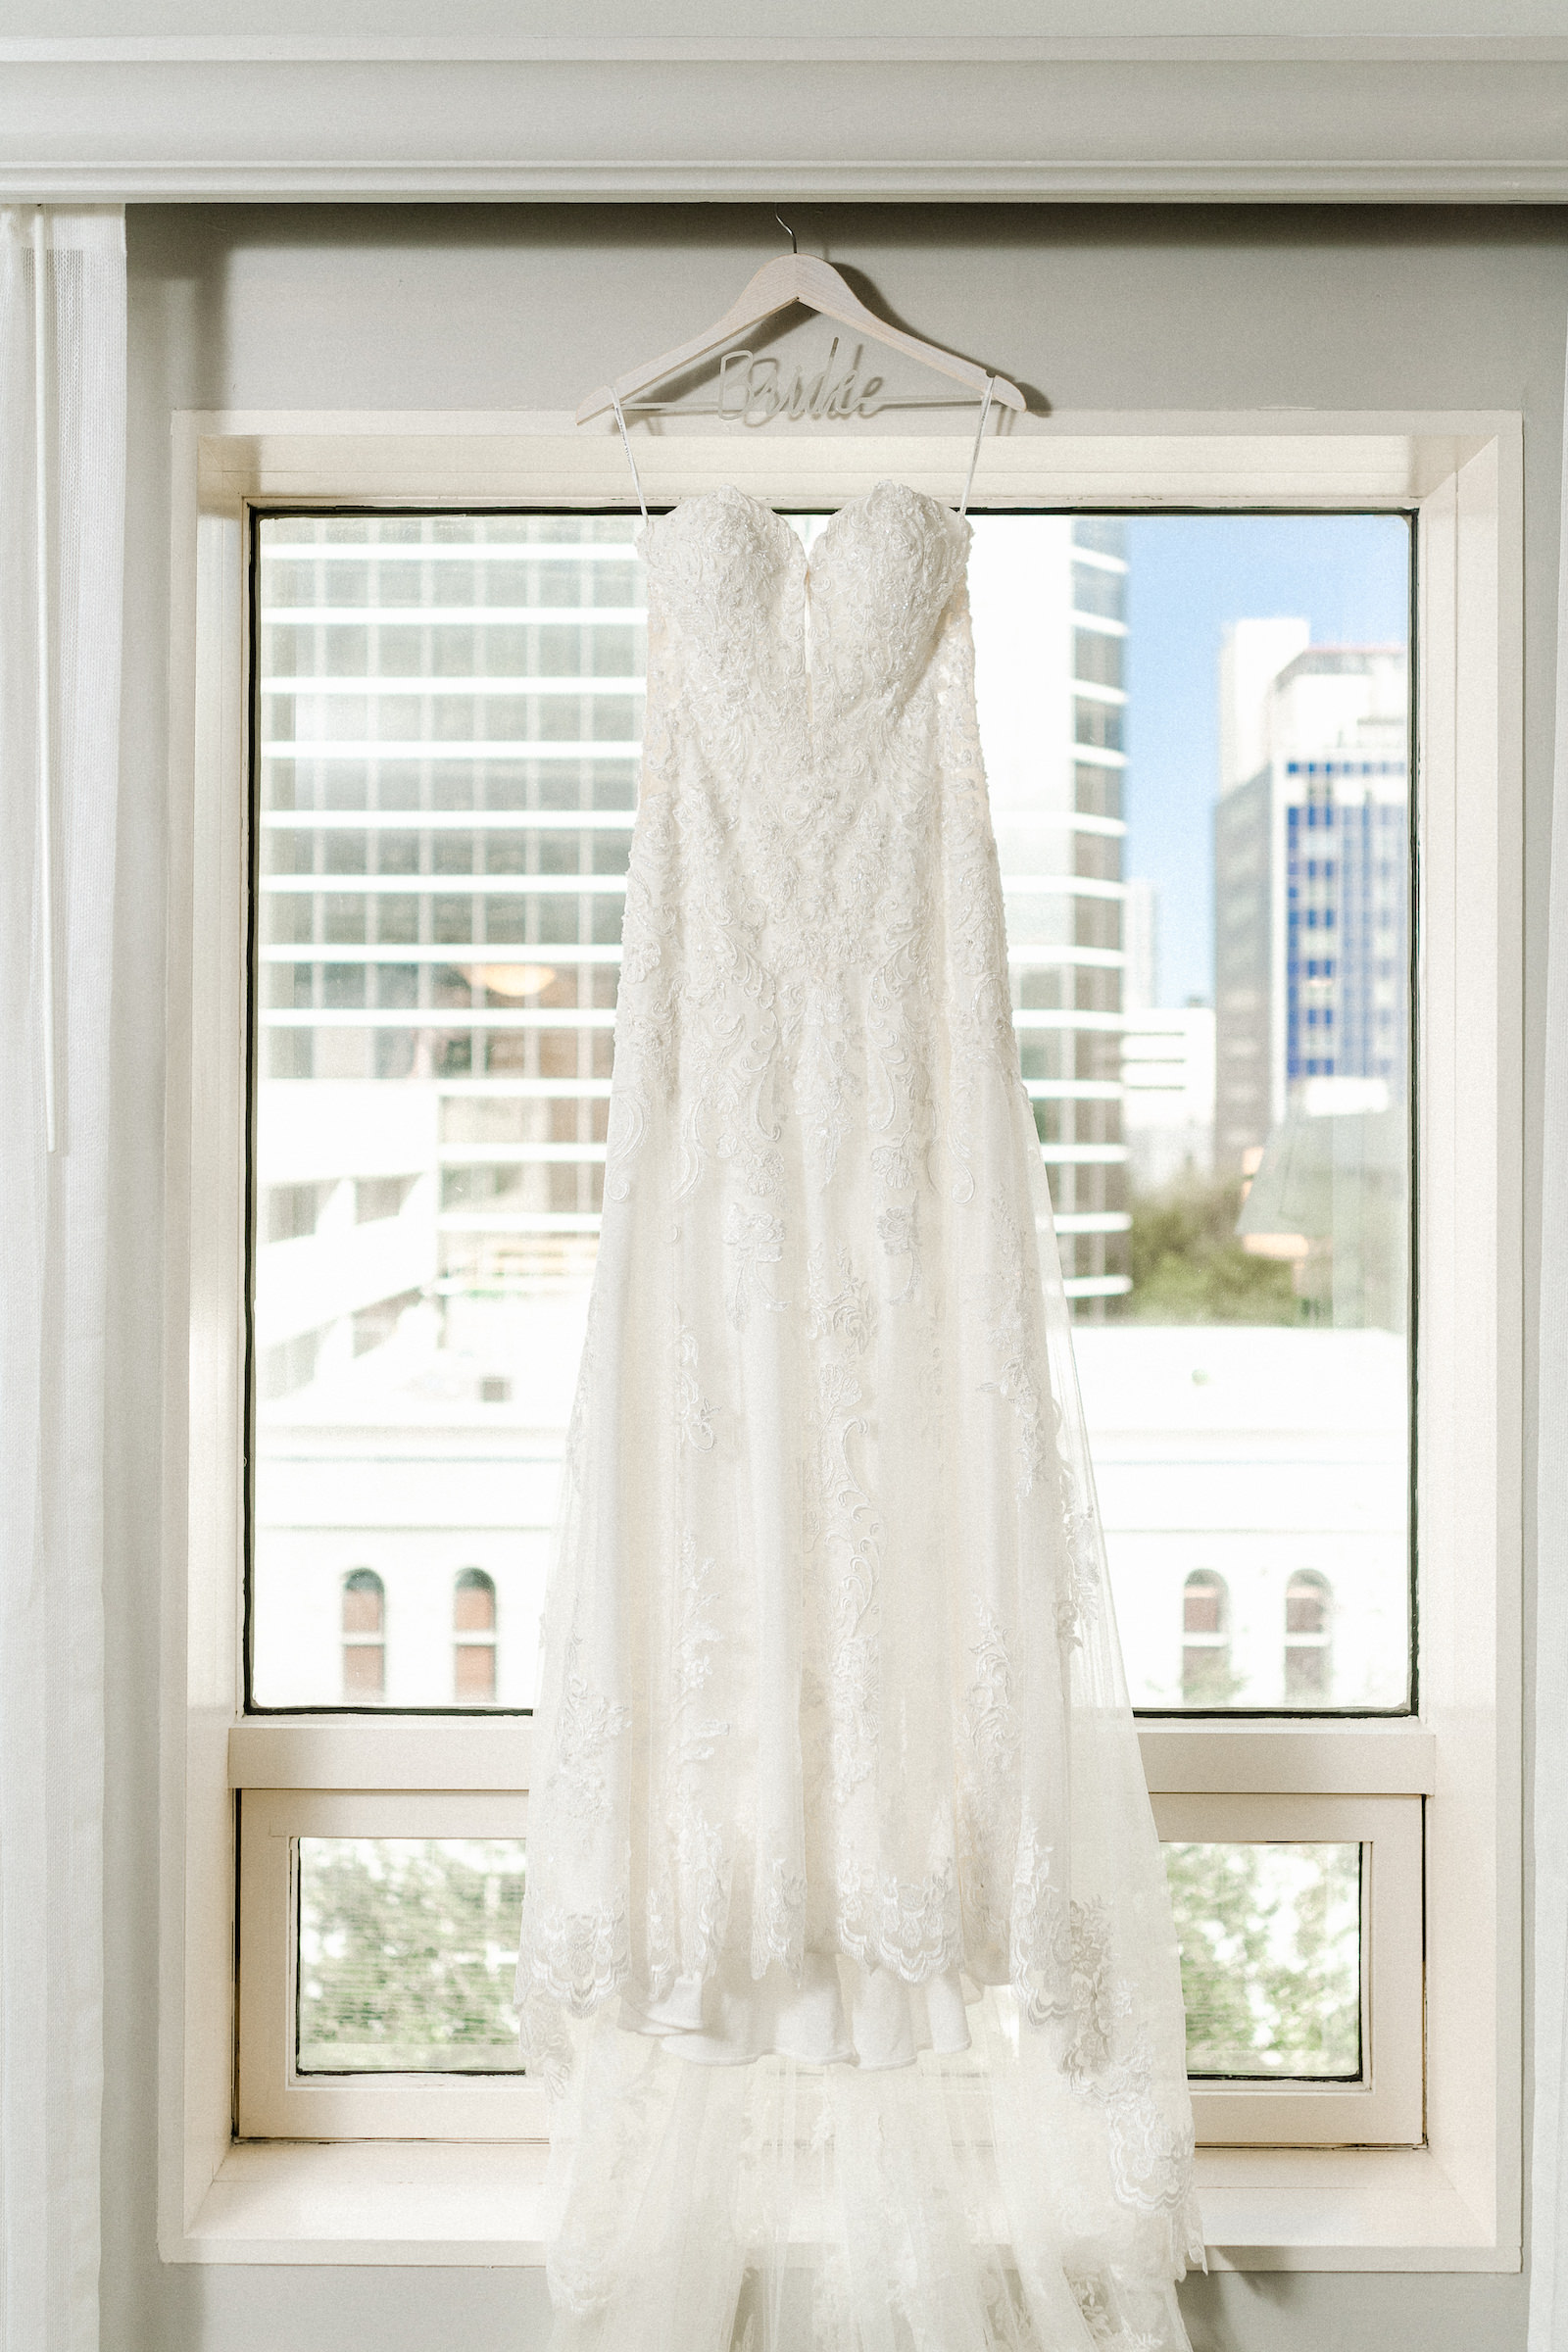 Wedding Dress Hanger Shot | White Lace Sweetheart Neckline Strapless Sheath Wedding Dress Bridal Gown Hanging in Window